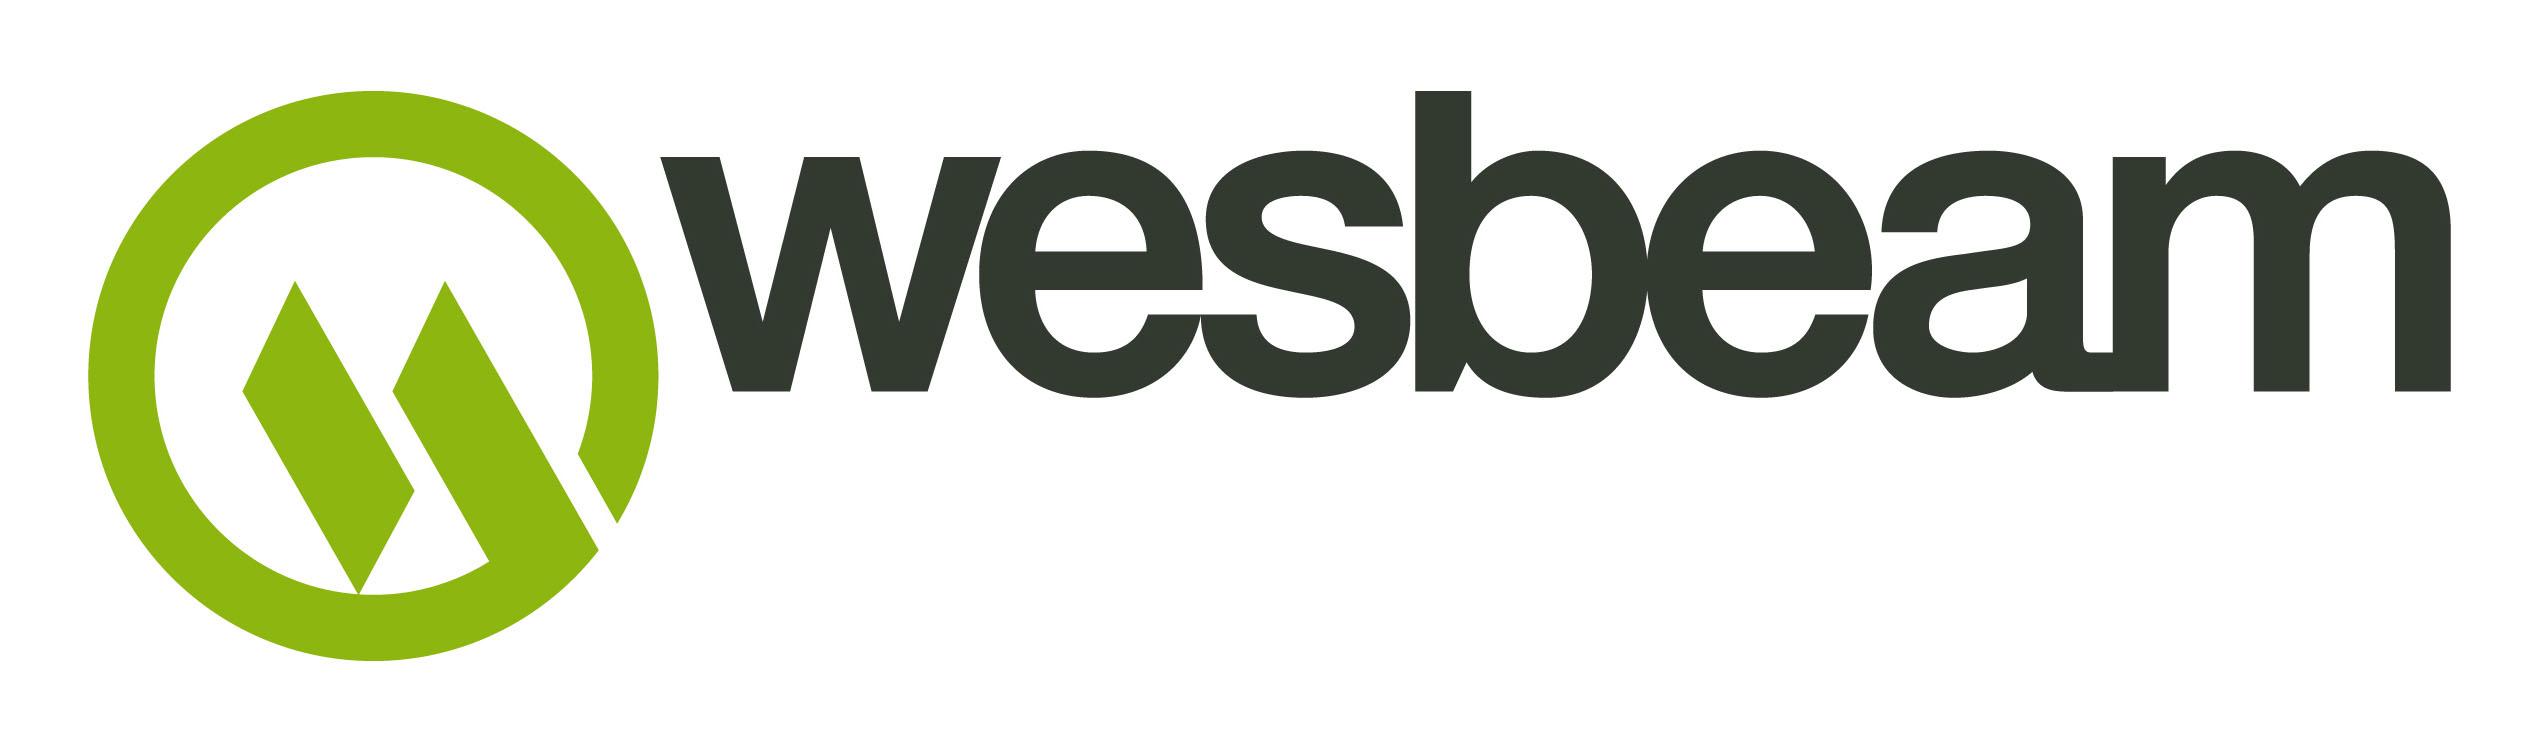 Wesbean Logo